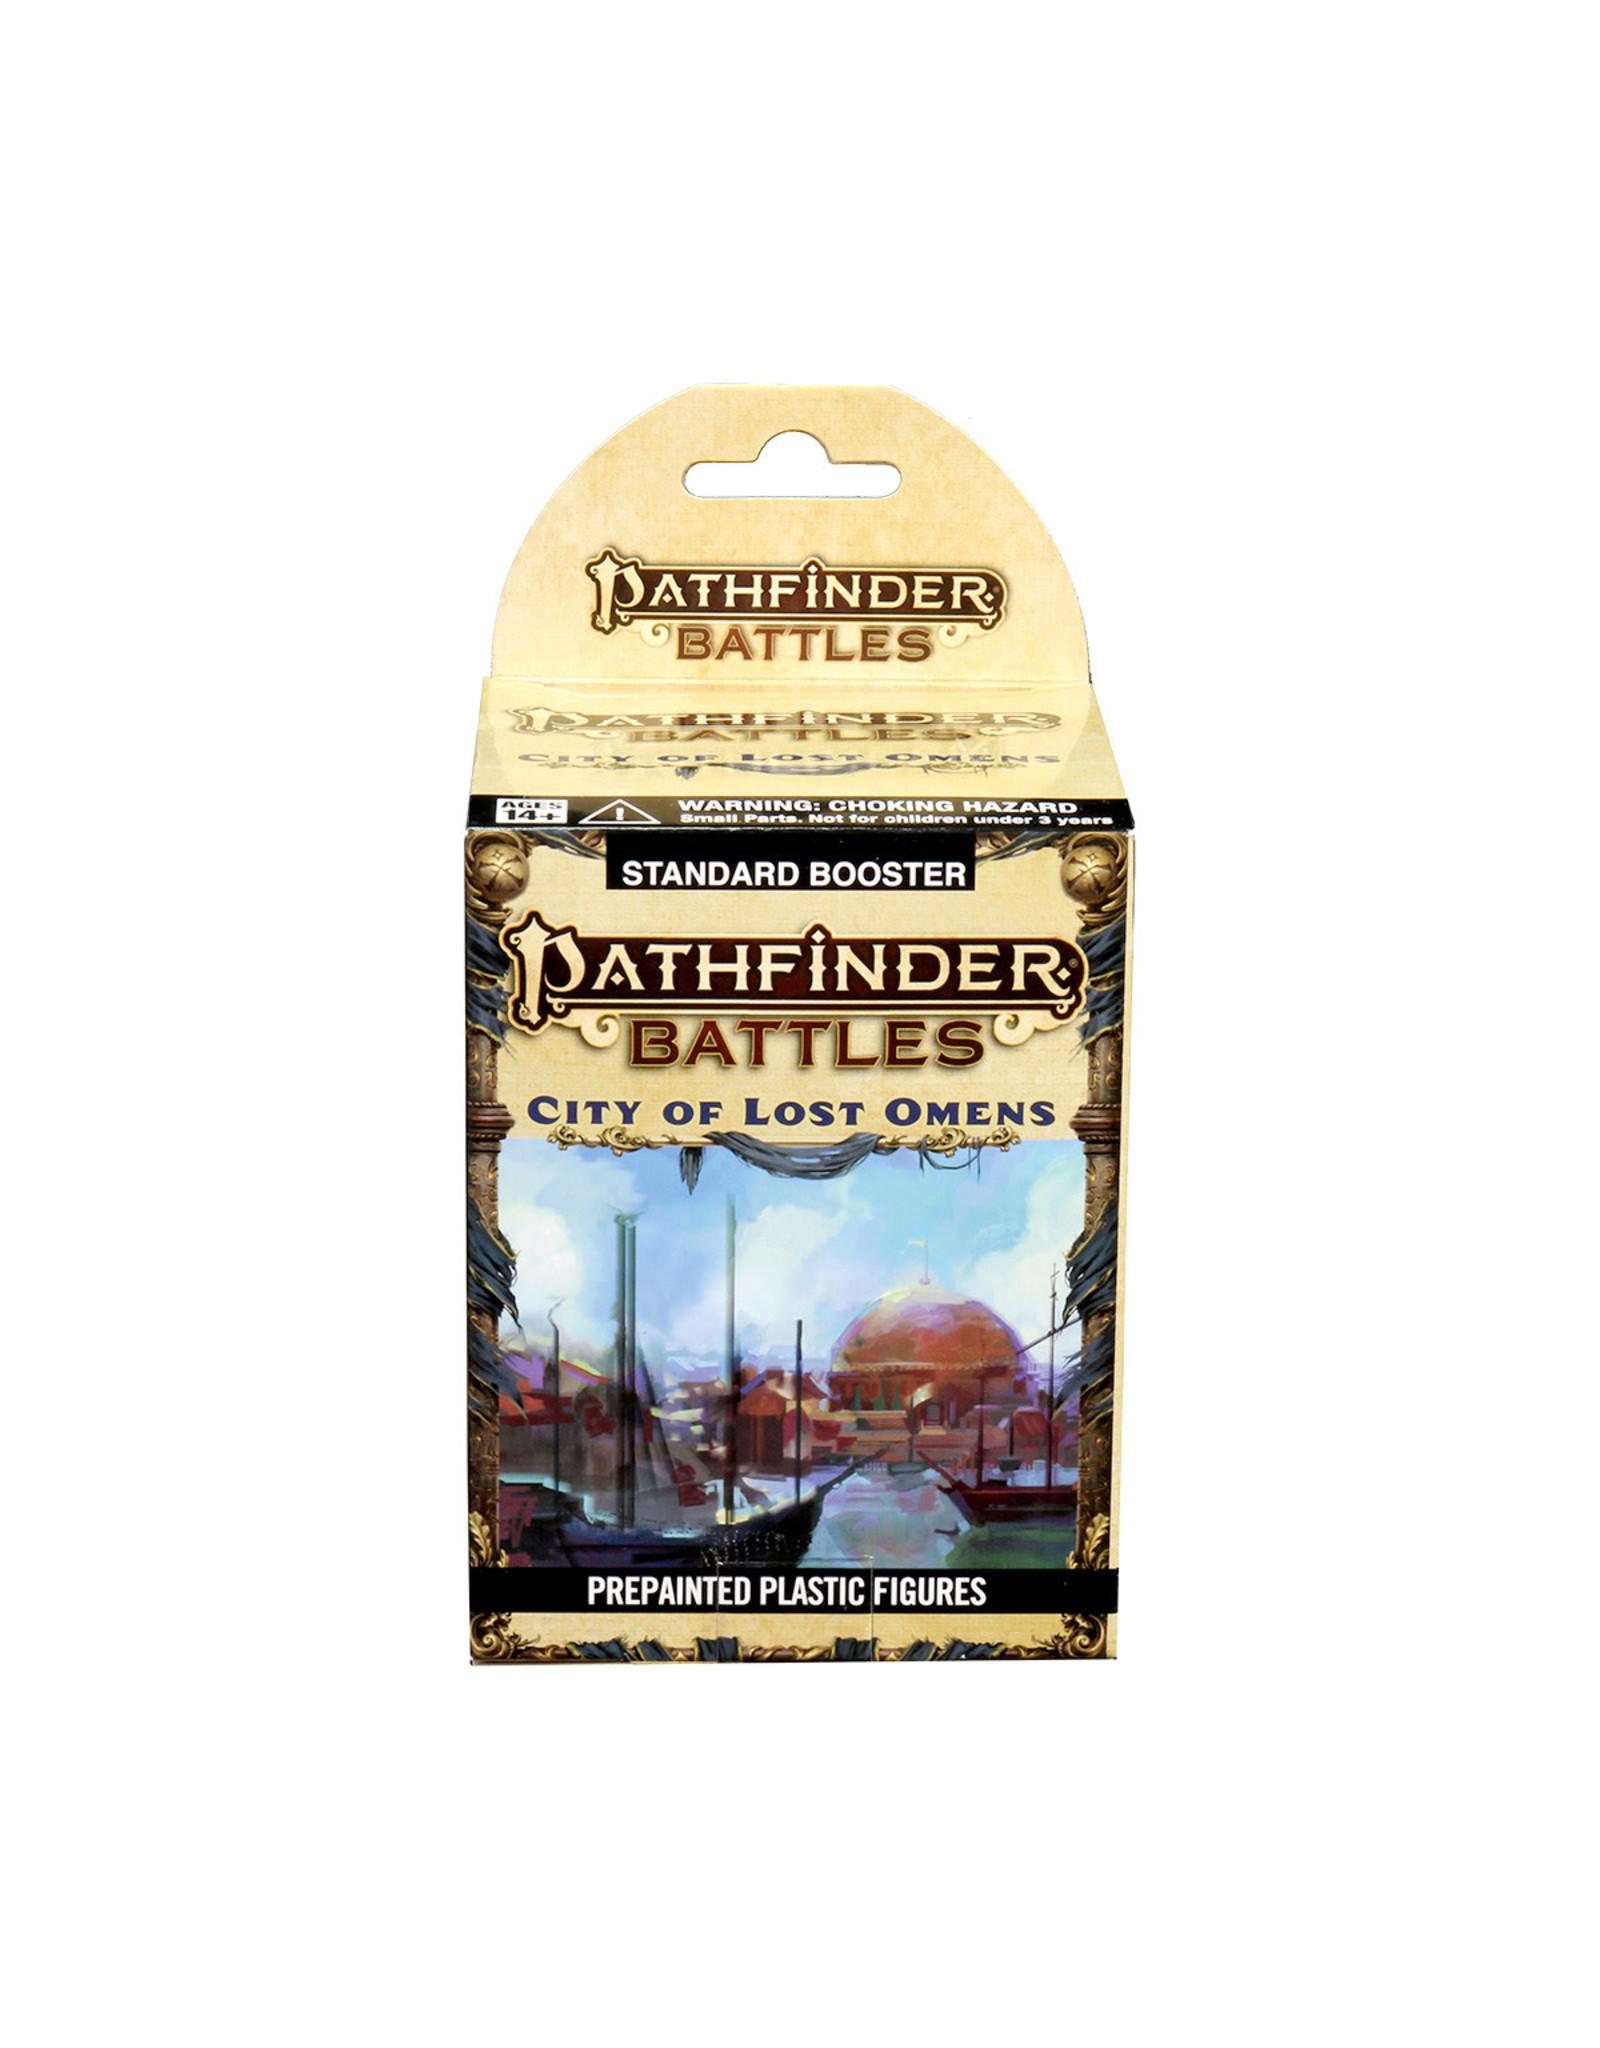 Wizkids Pathfinder Battles: City of Lost Omens Booster pack